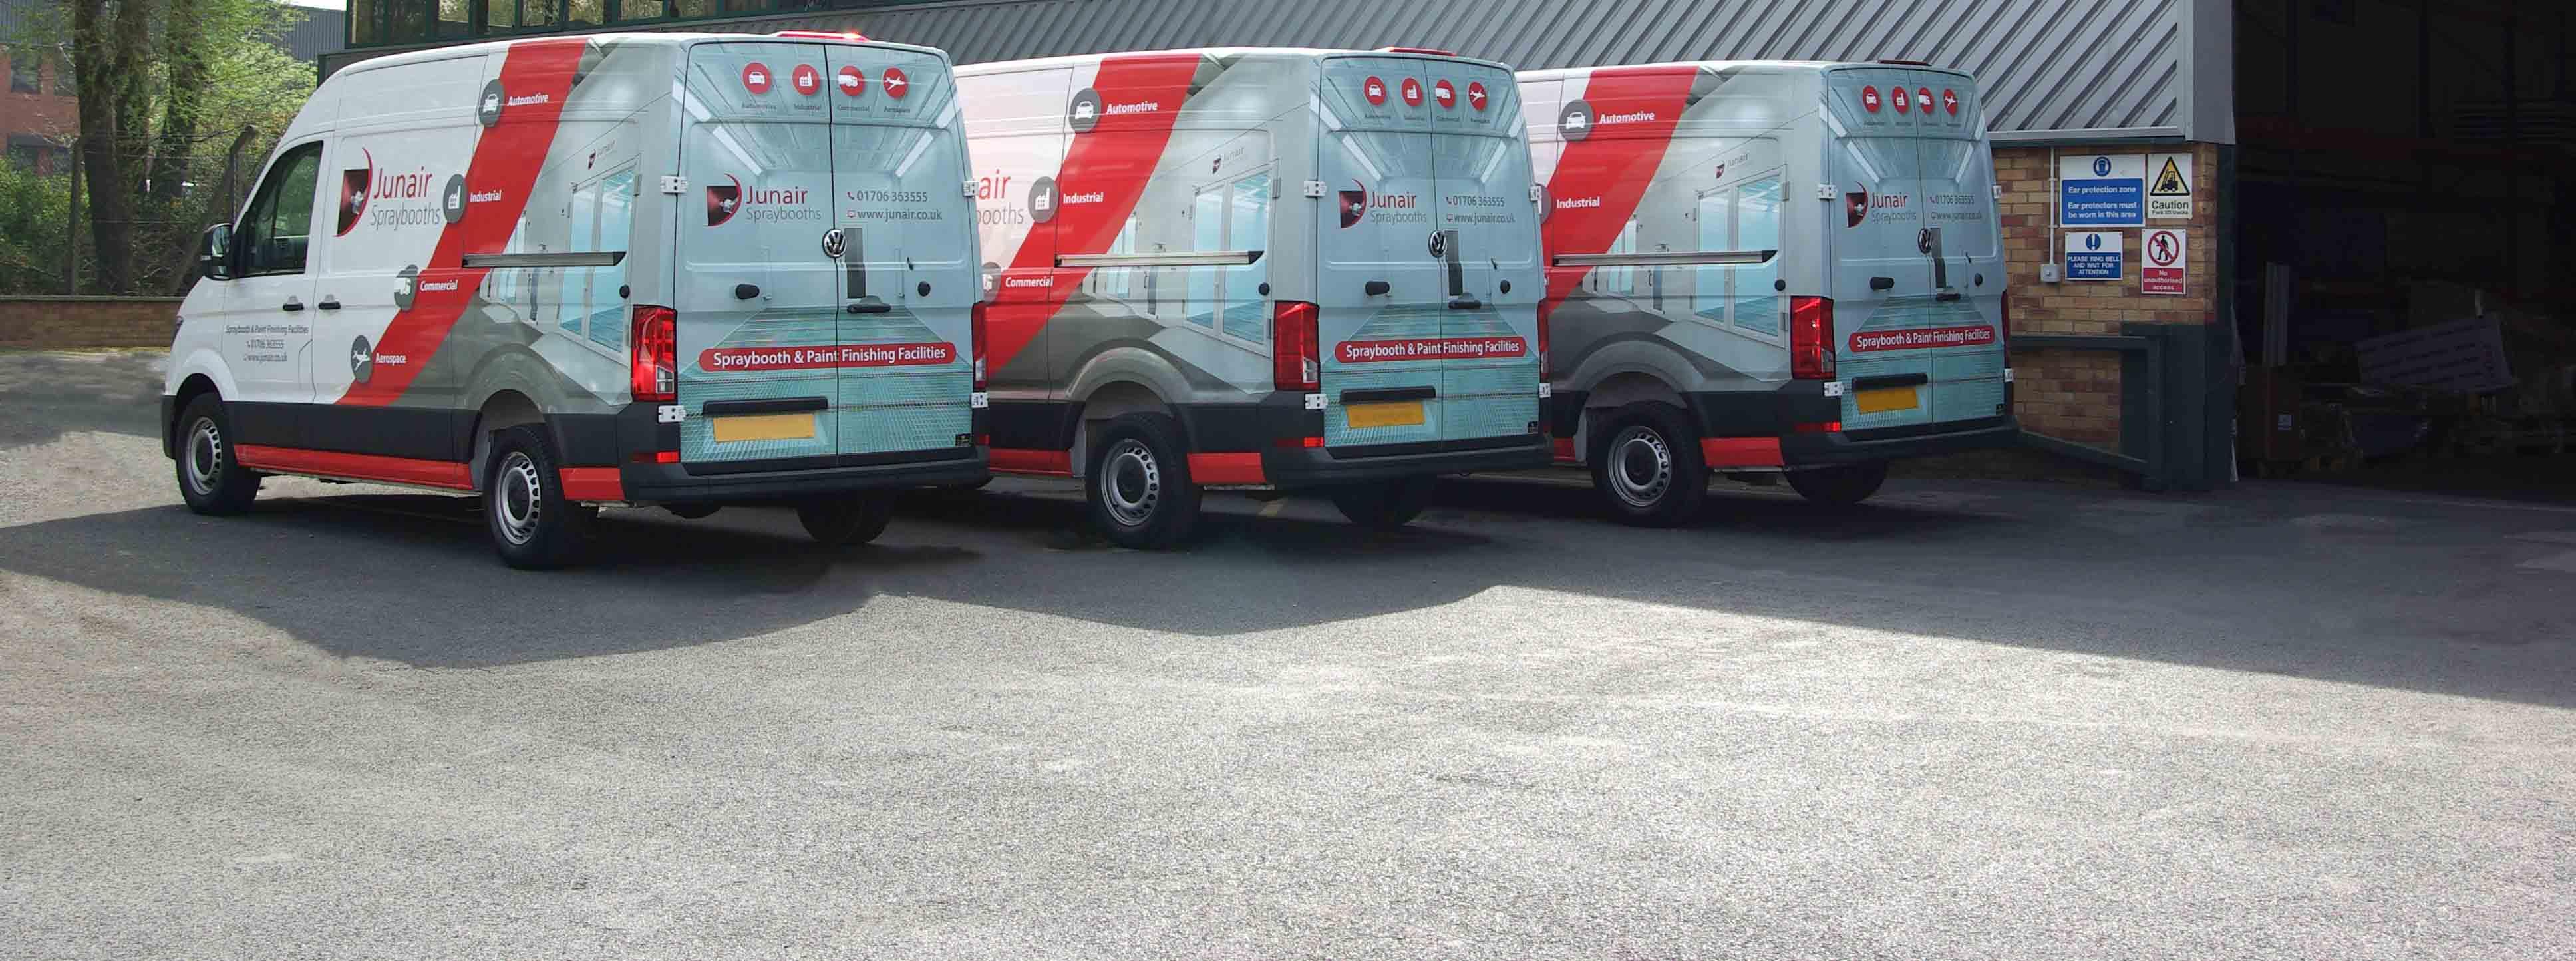 Junair Spraybooths vans